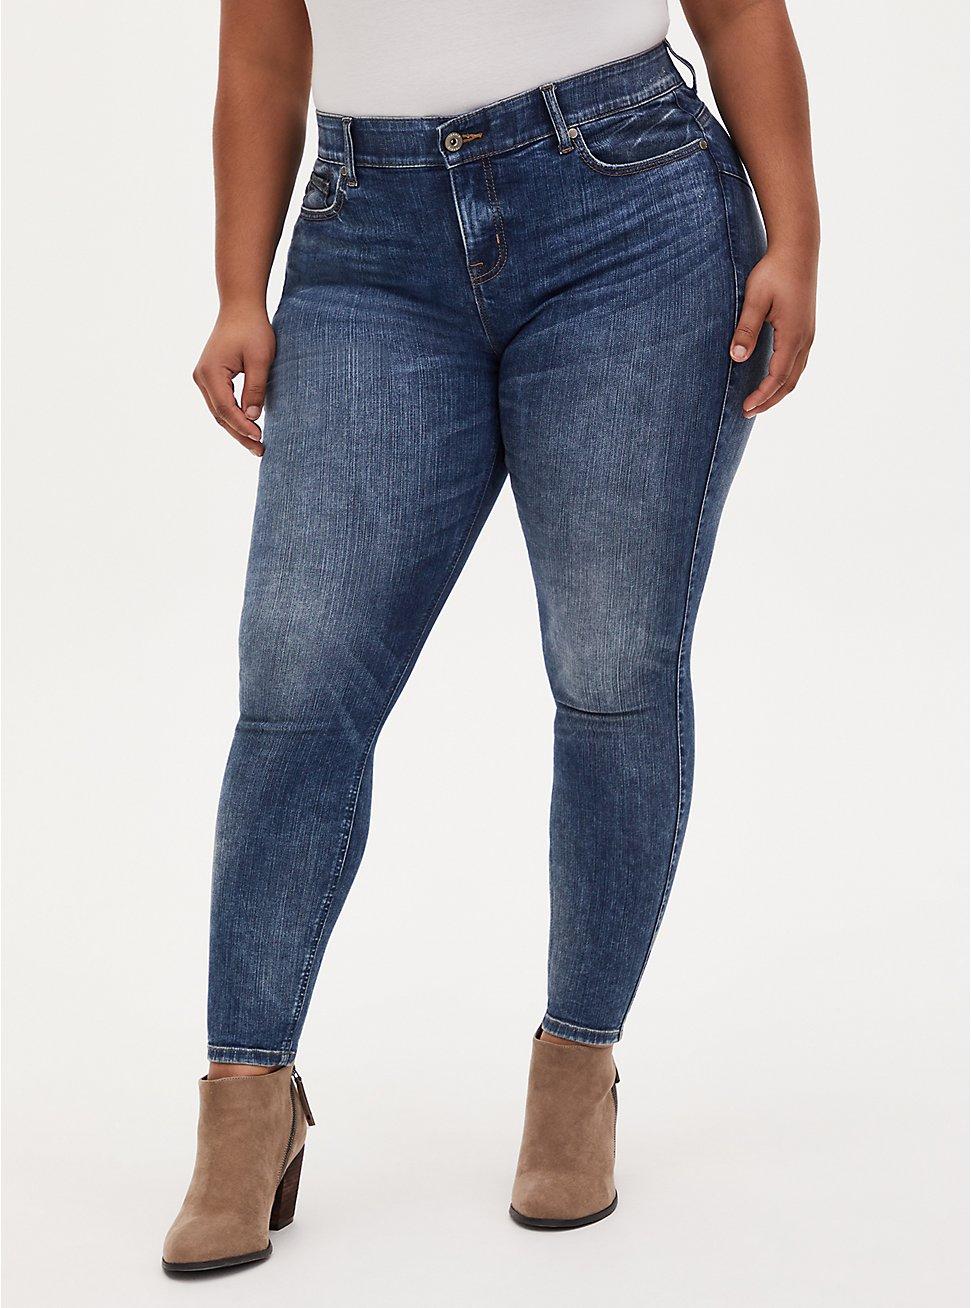 Plus Size Bombshell Skinny Jean - Premium Stretch Medium Wash, MELROSE, hi-res